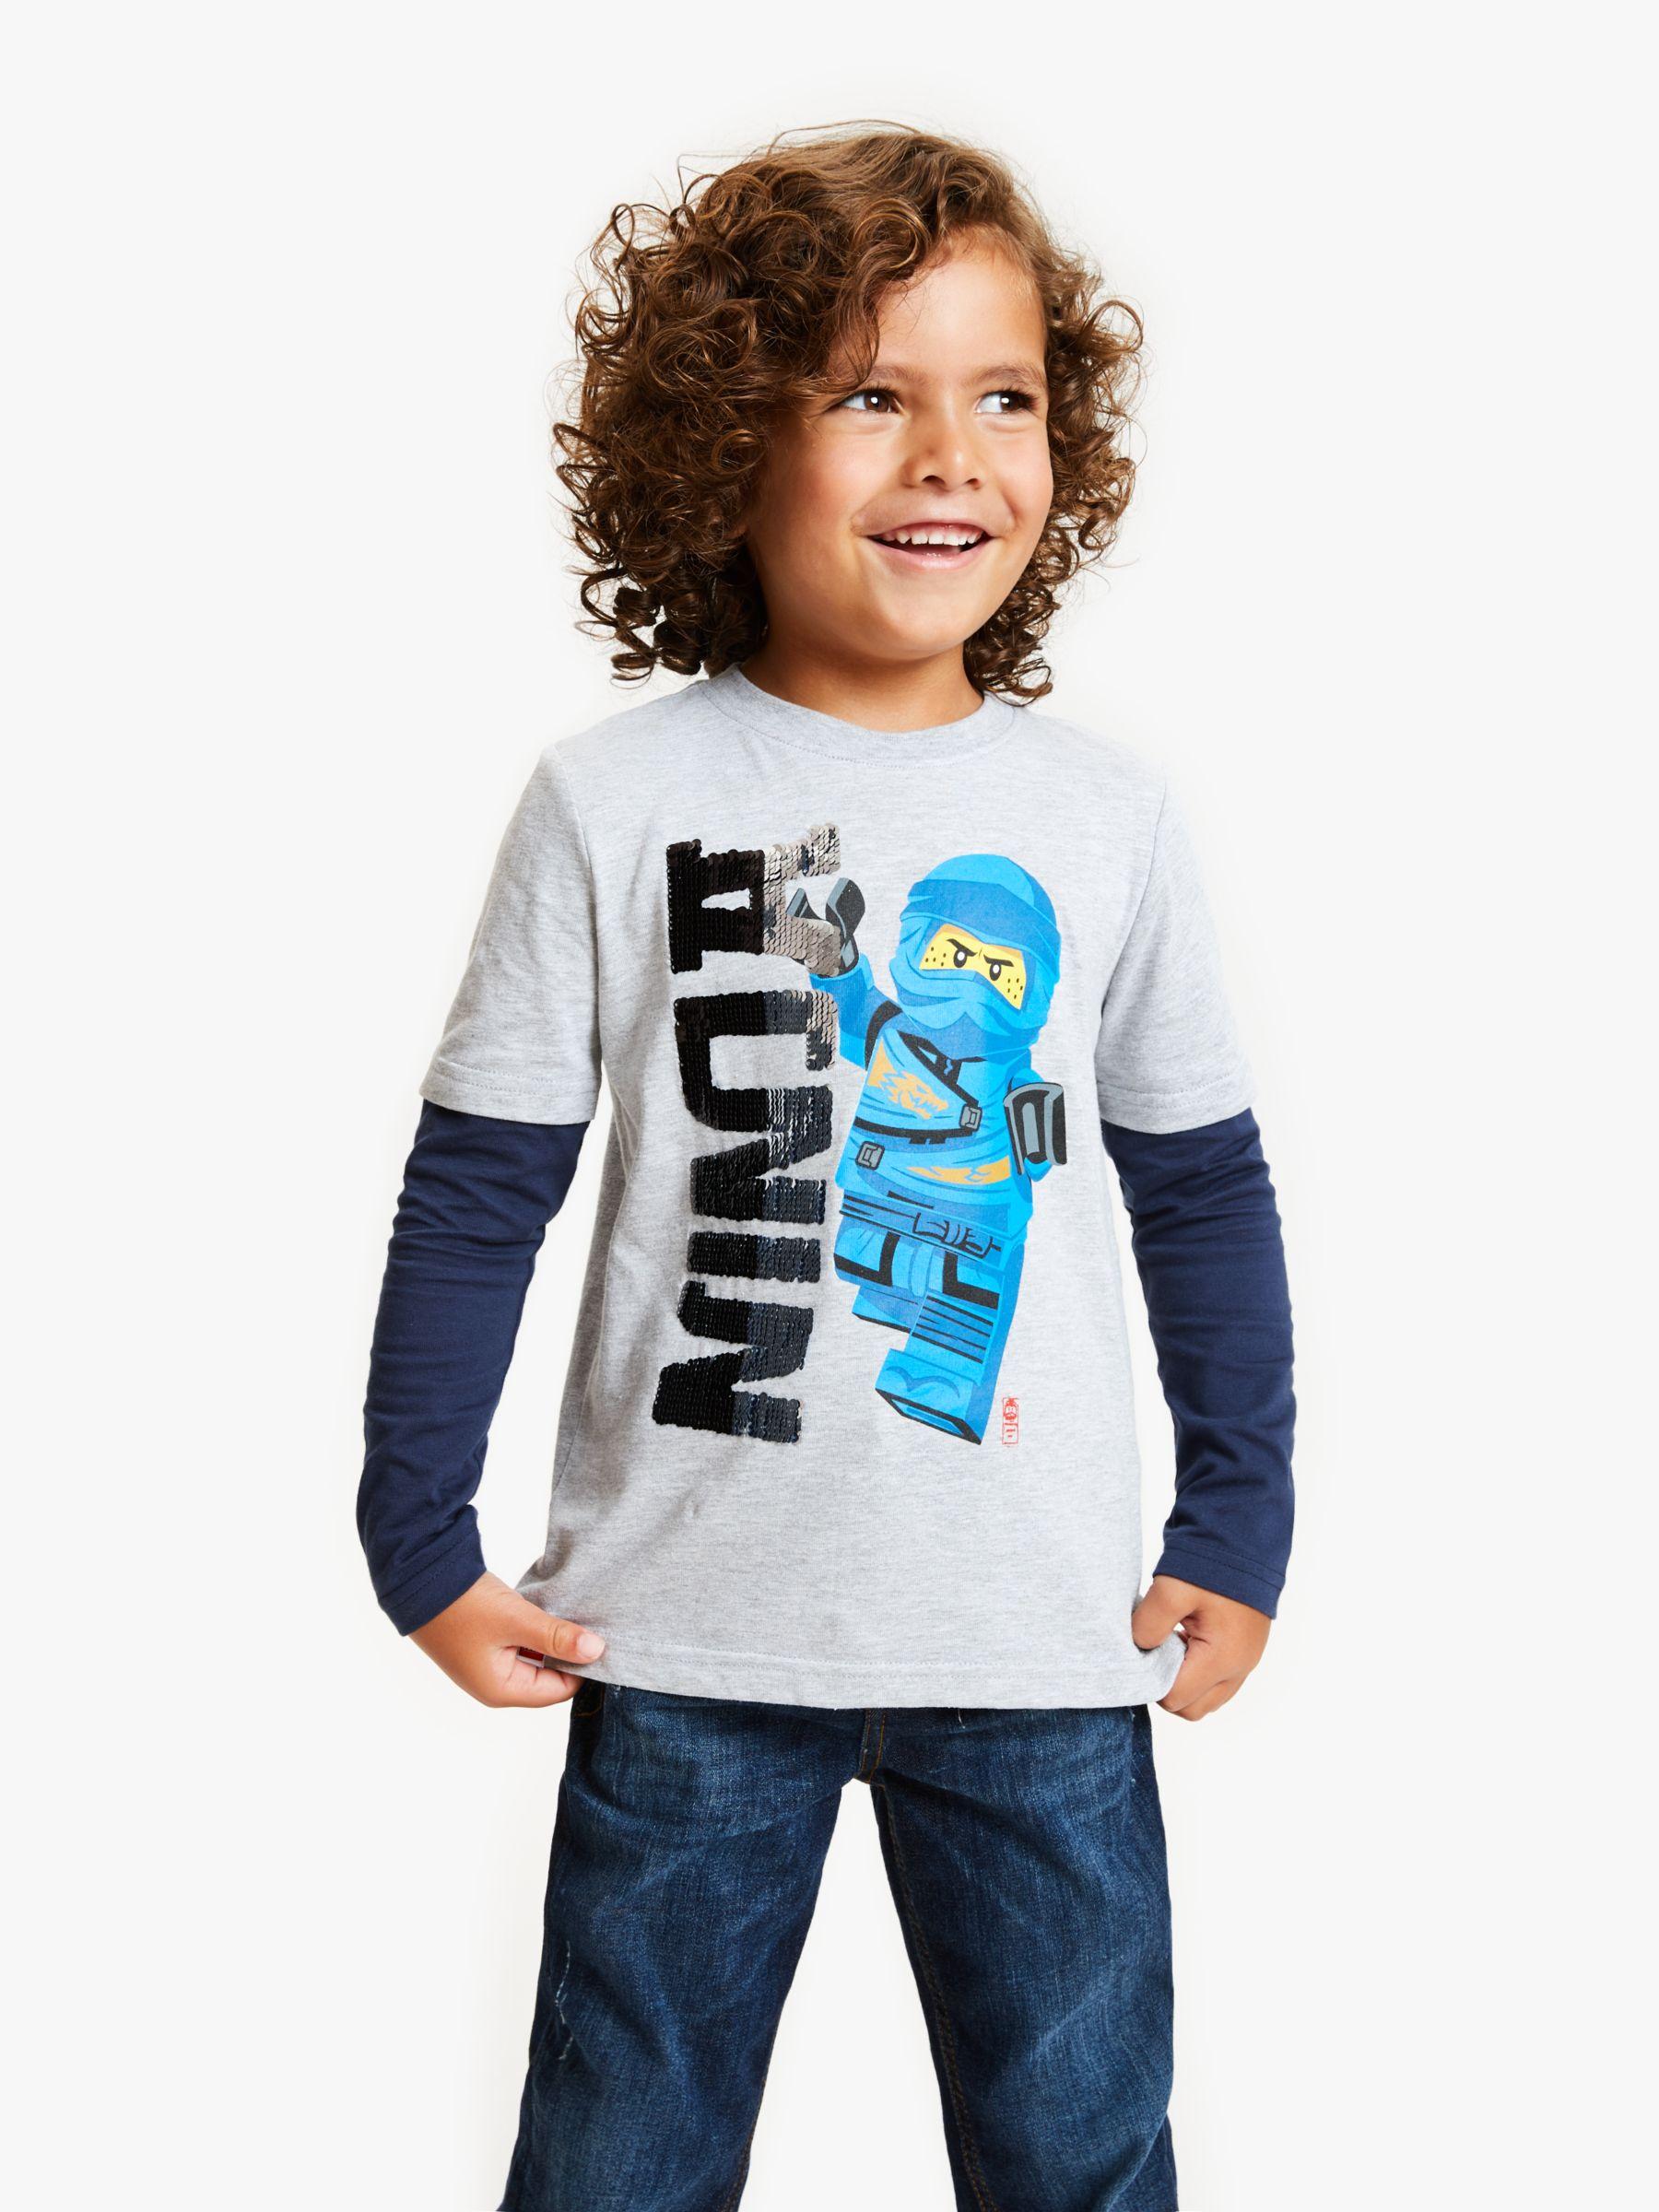 Retirement Plan Childrens Long Sleeve T-Shirt Boys Cotton Tee Tops